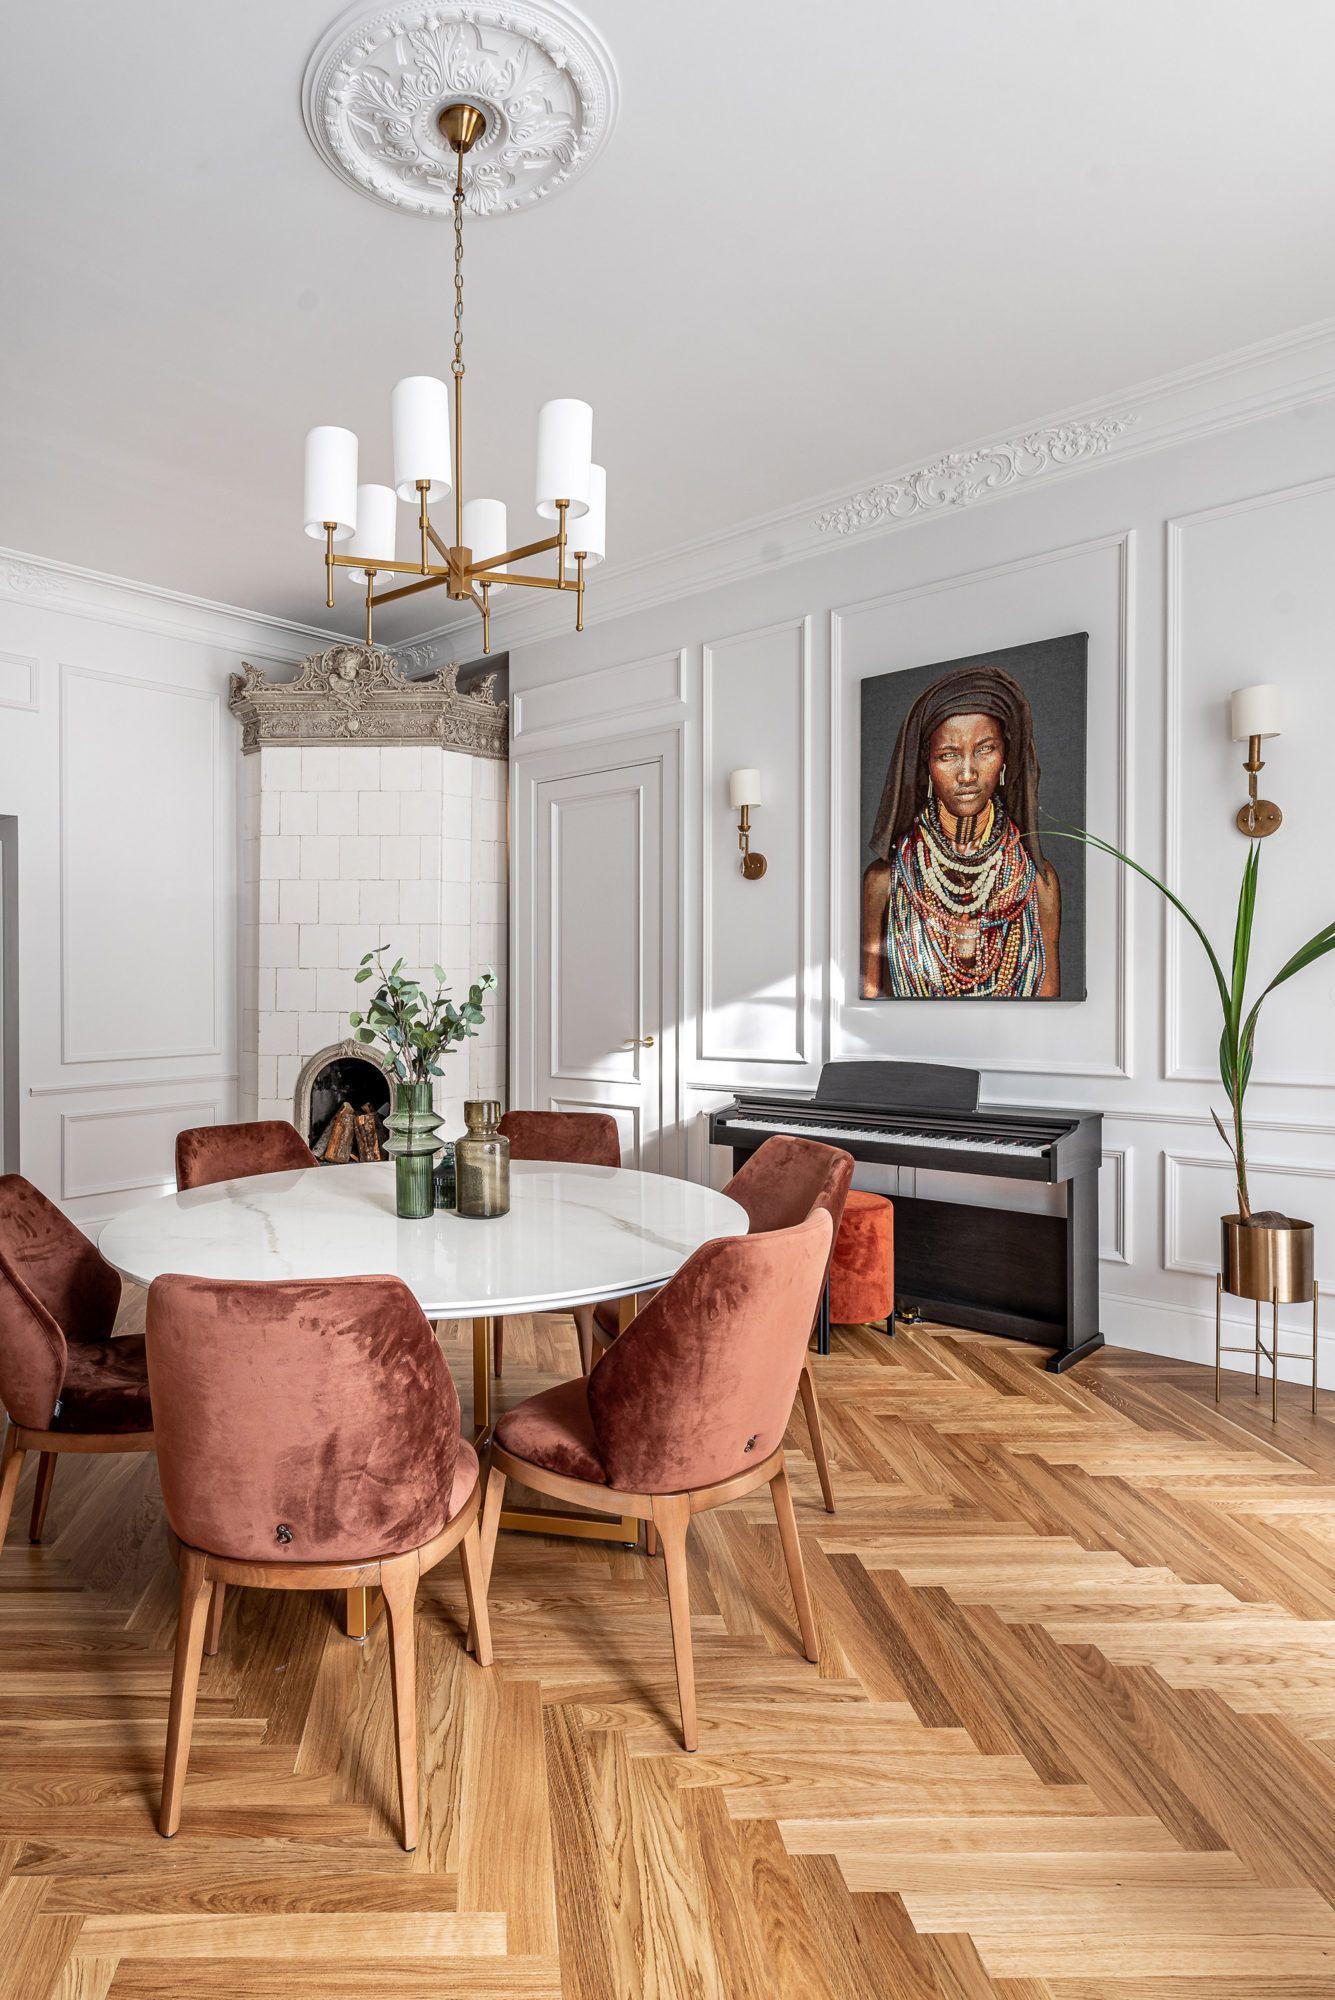 Photo of Apartment in the center of Vilnius, 150 m² – home accessories